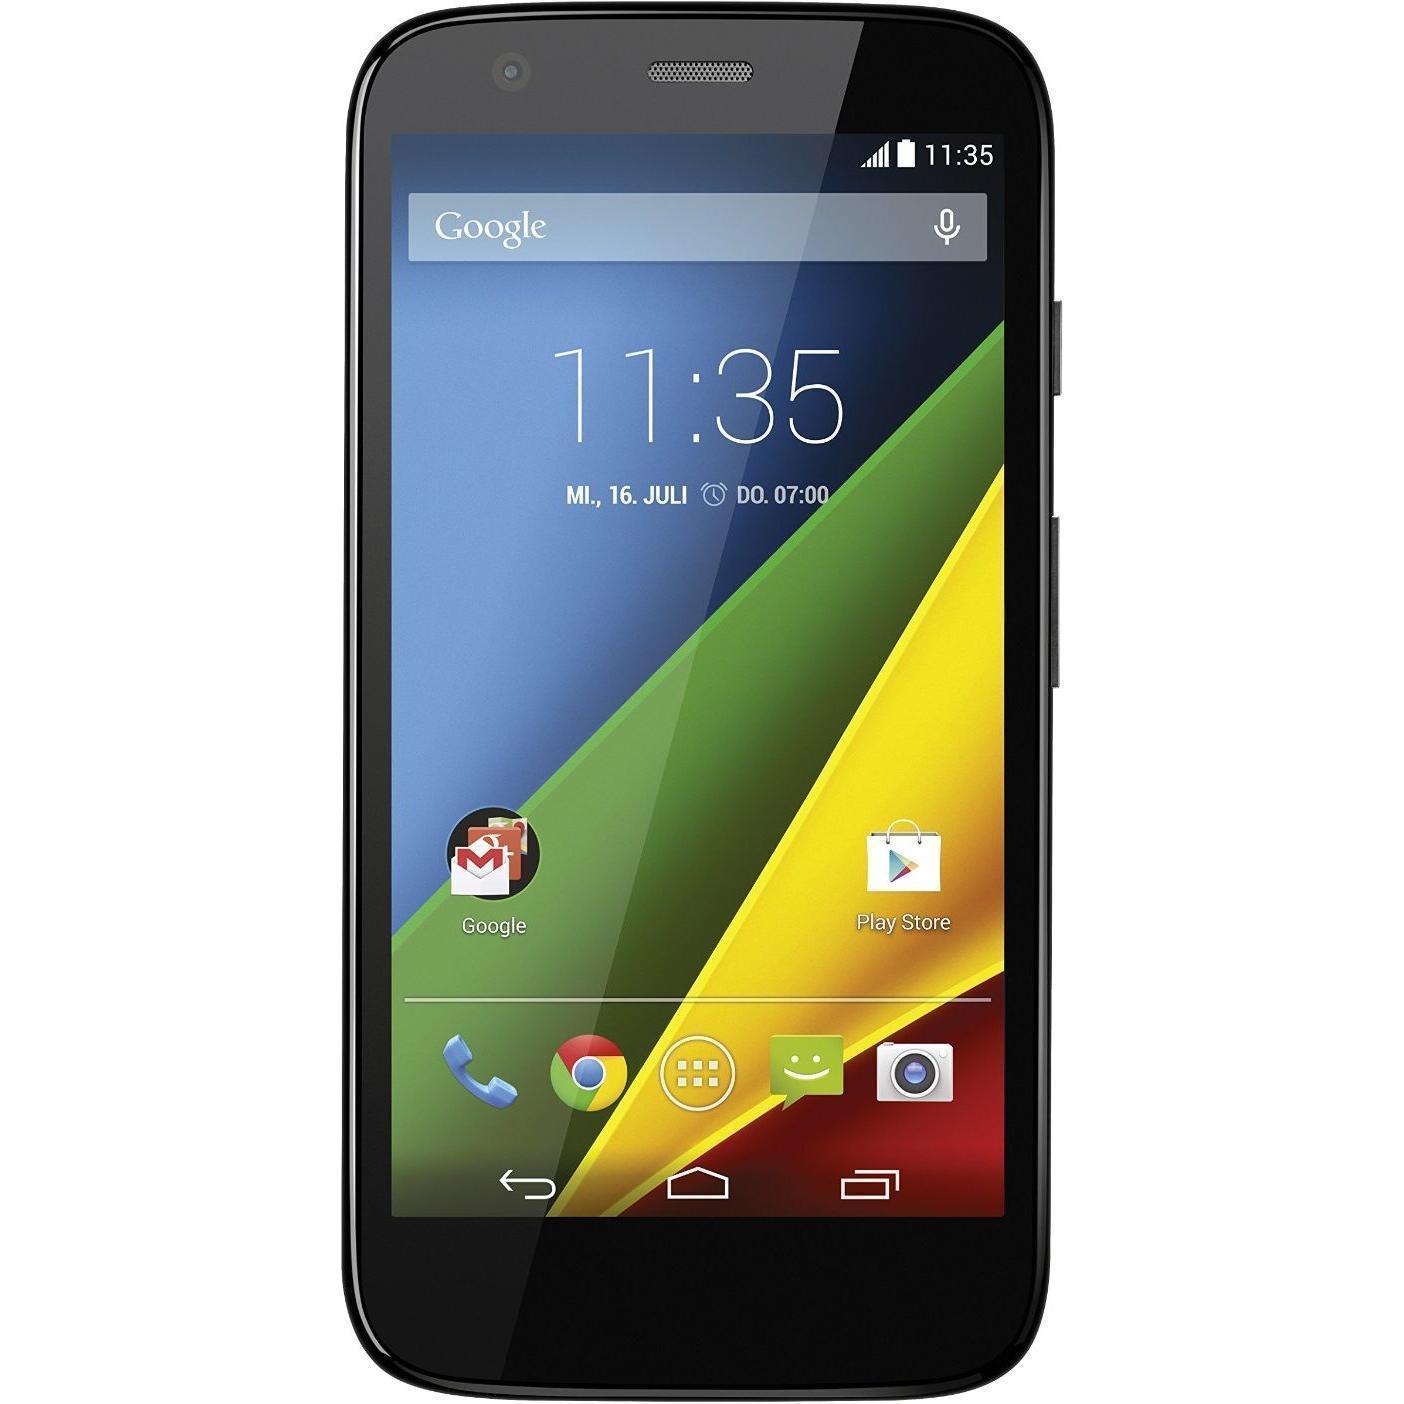 Motorola Moto G 4G (1. Gen.) 8 GB - Negro - Libre